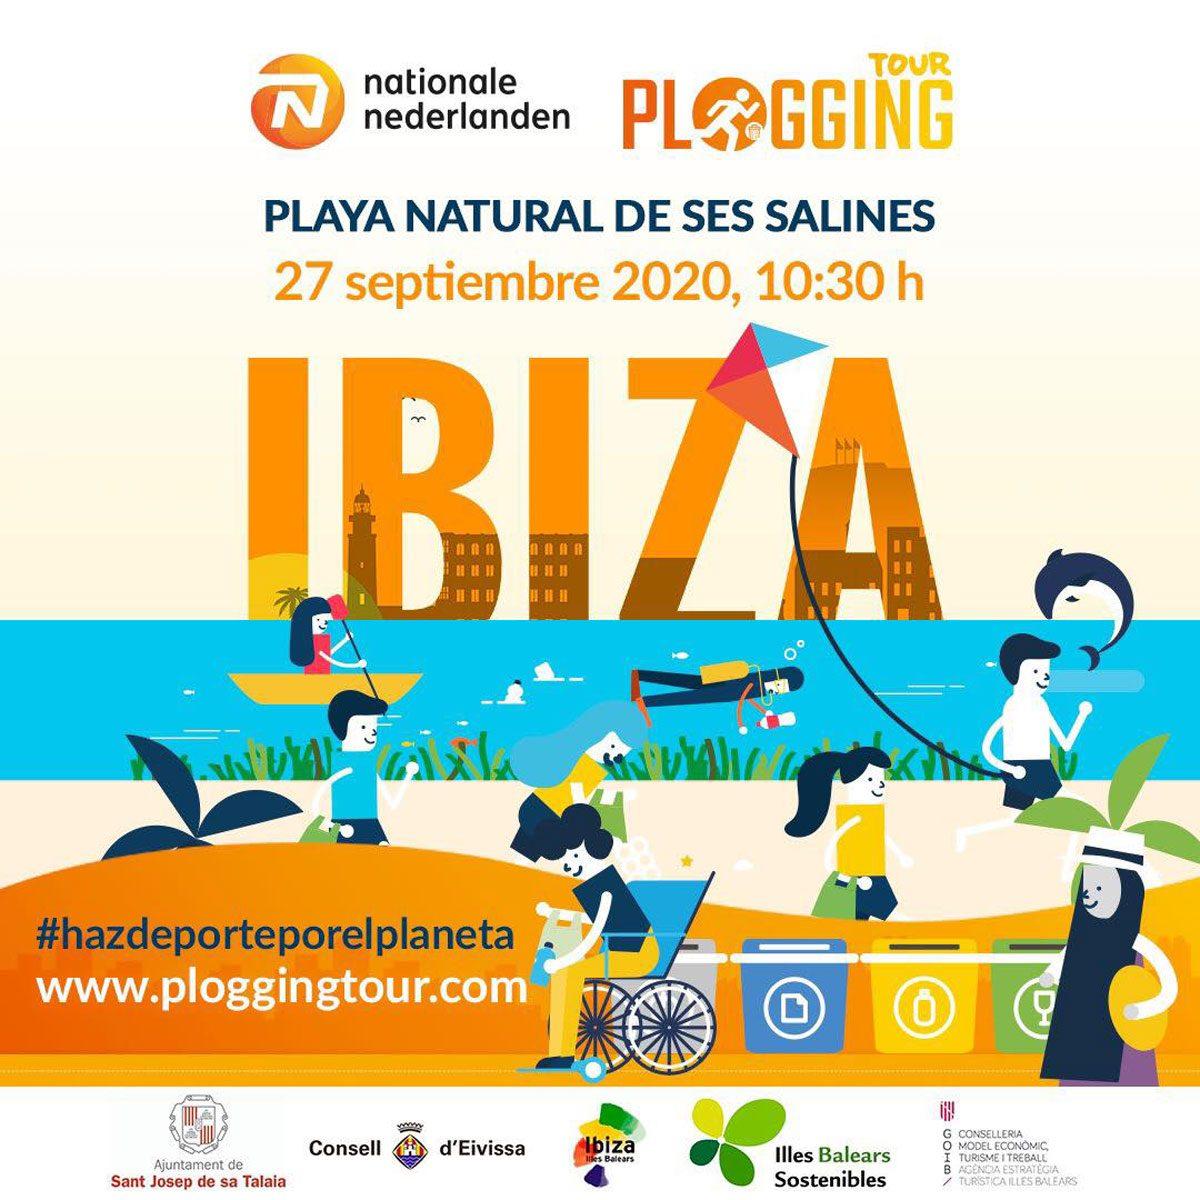 Ибица-plogging-tour-las-salinas-2020-welcometoibiza